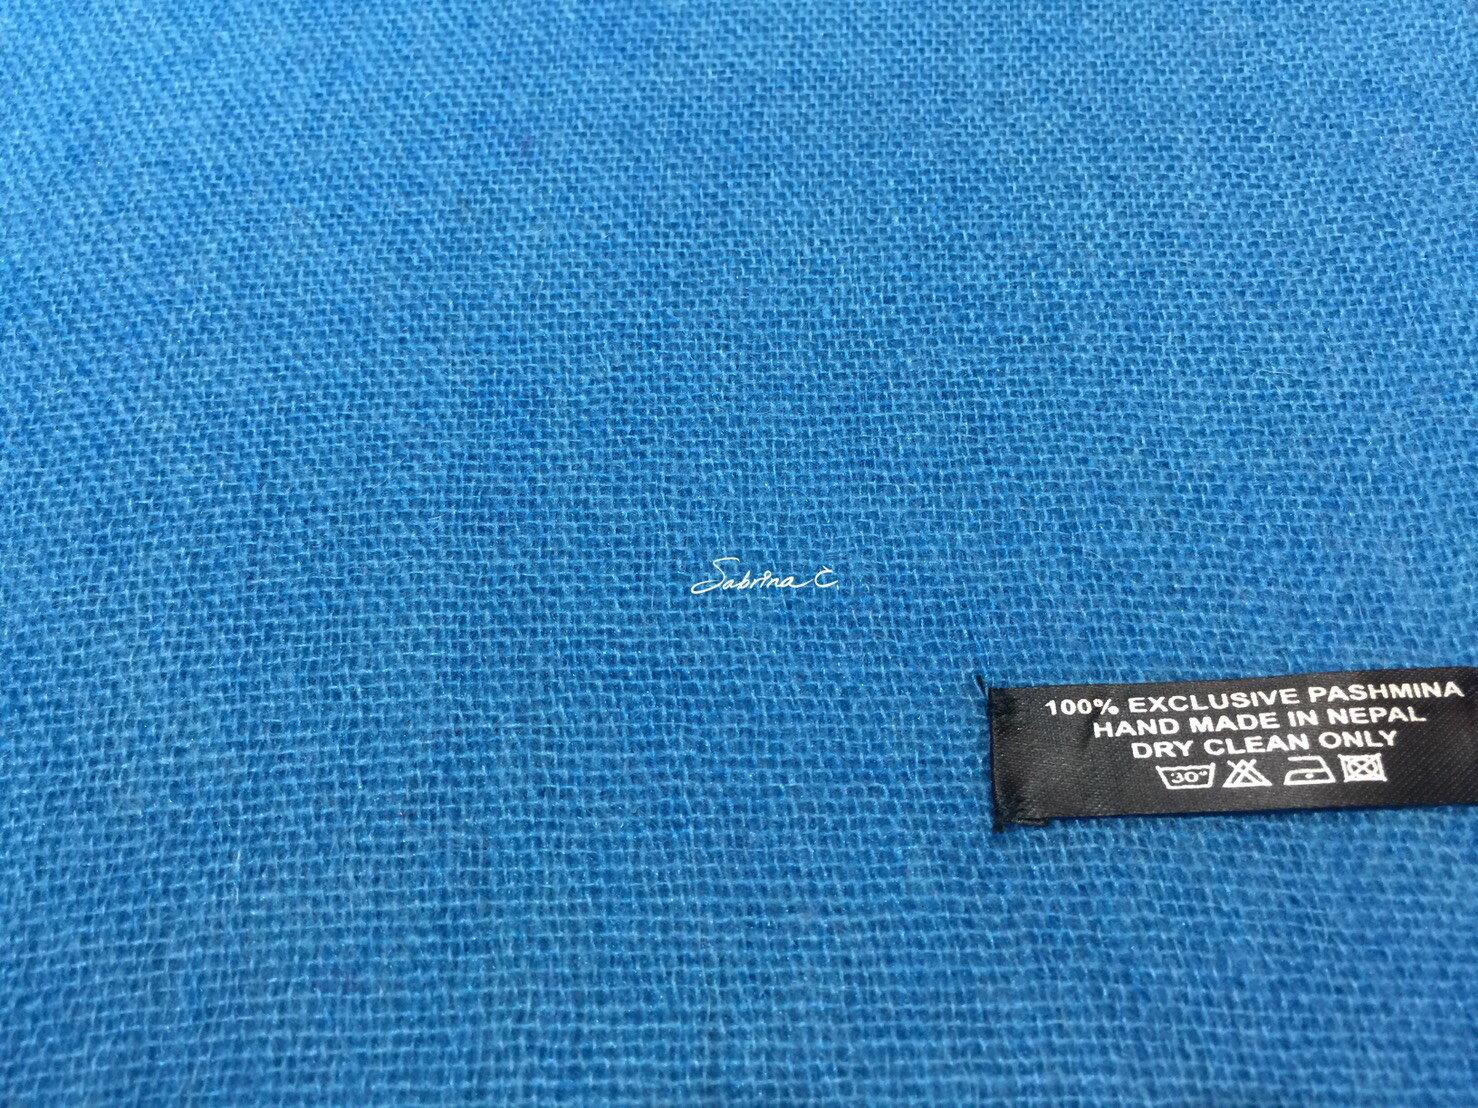 Cashmere薄織圍巾^(土耳其藍^)^(16088^)